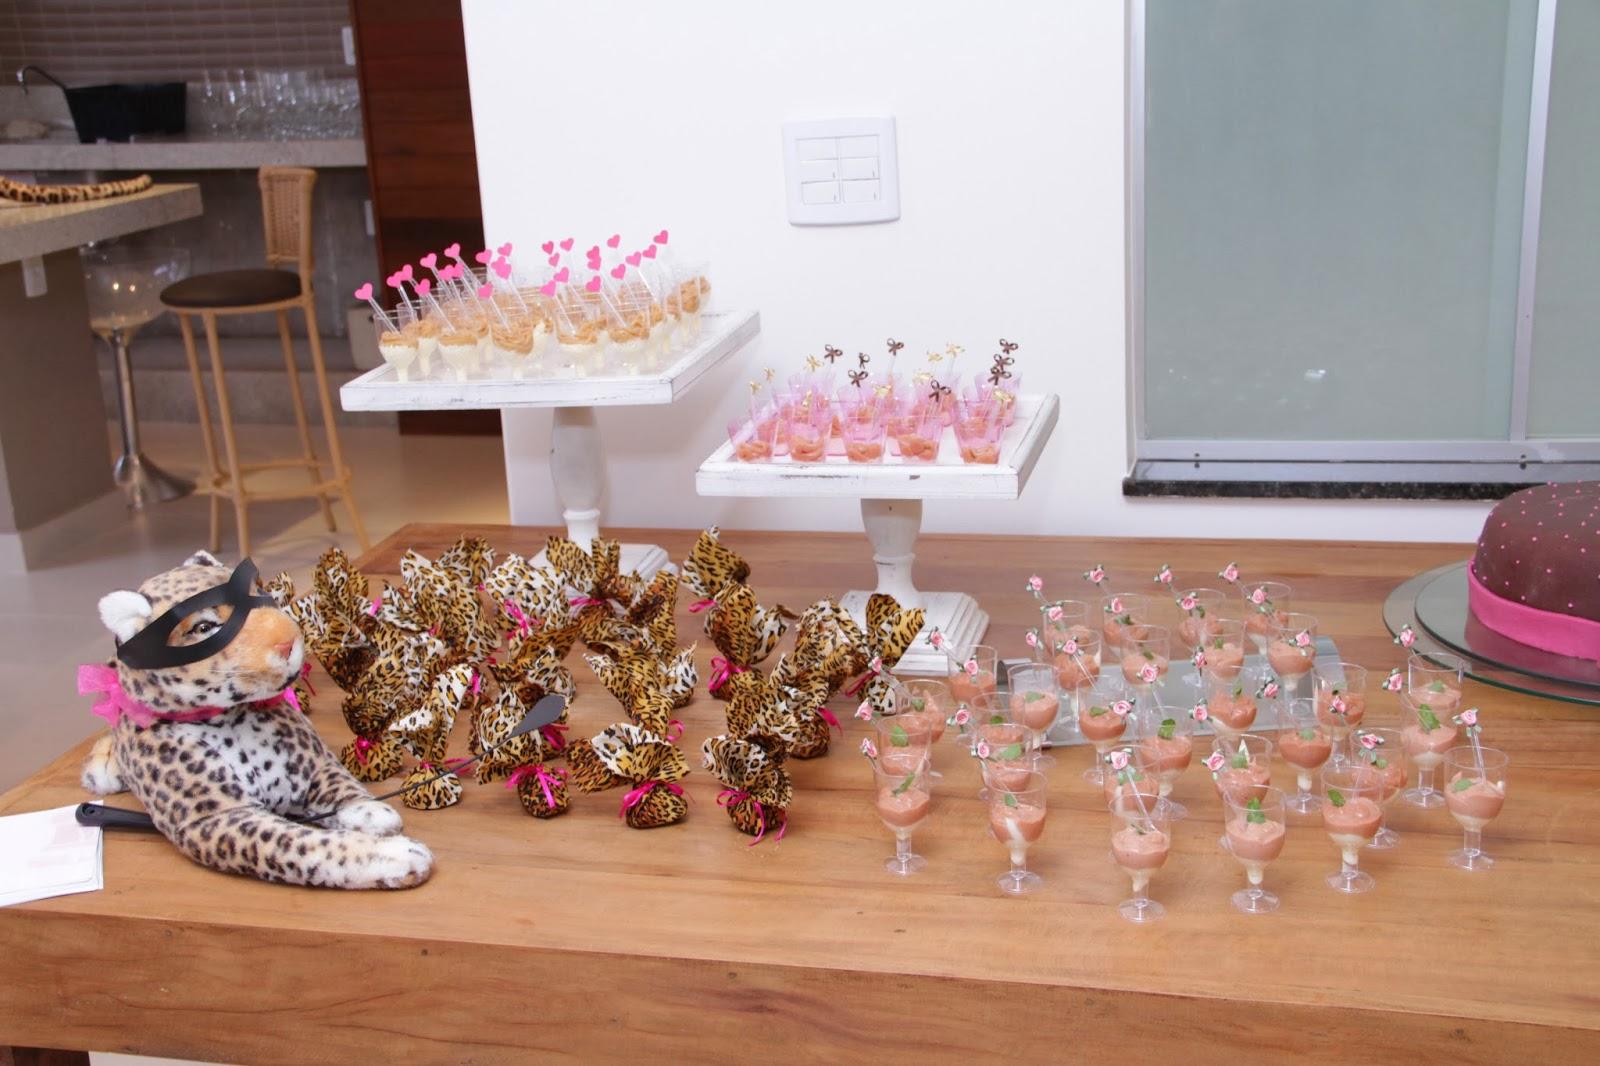 cha - cha lingerie - cha oncinha - mesa bolo - mesa doces - decoracao